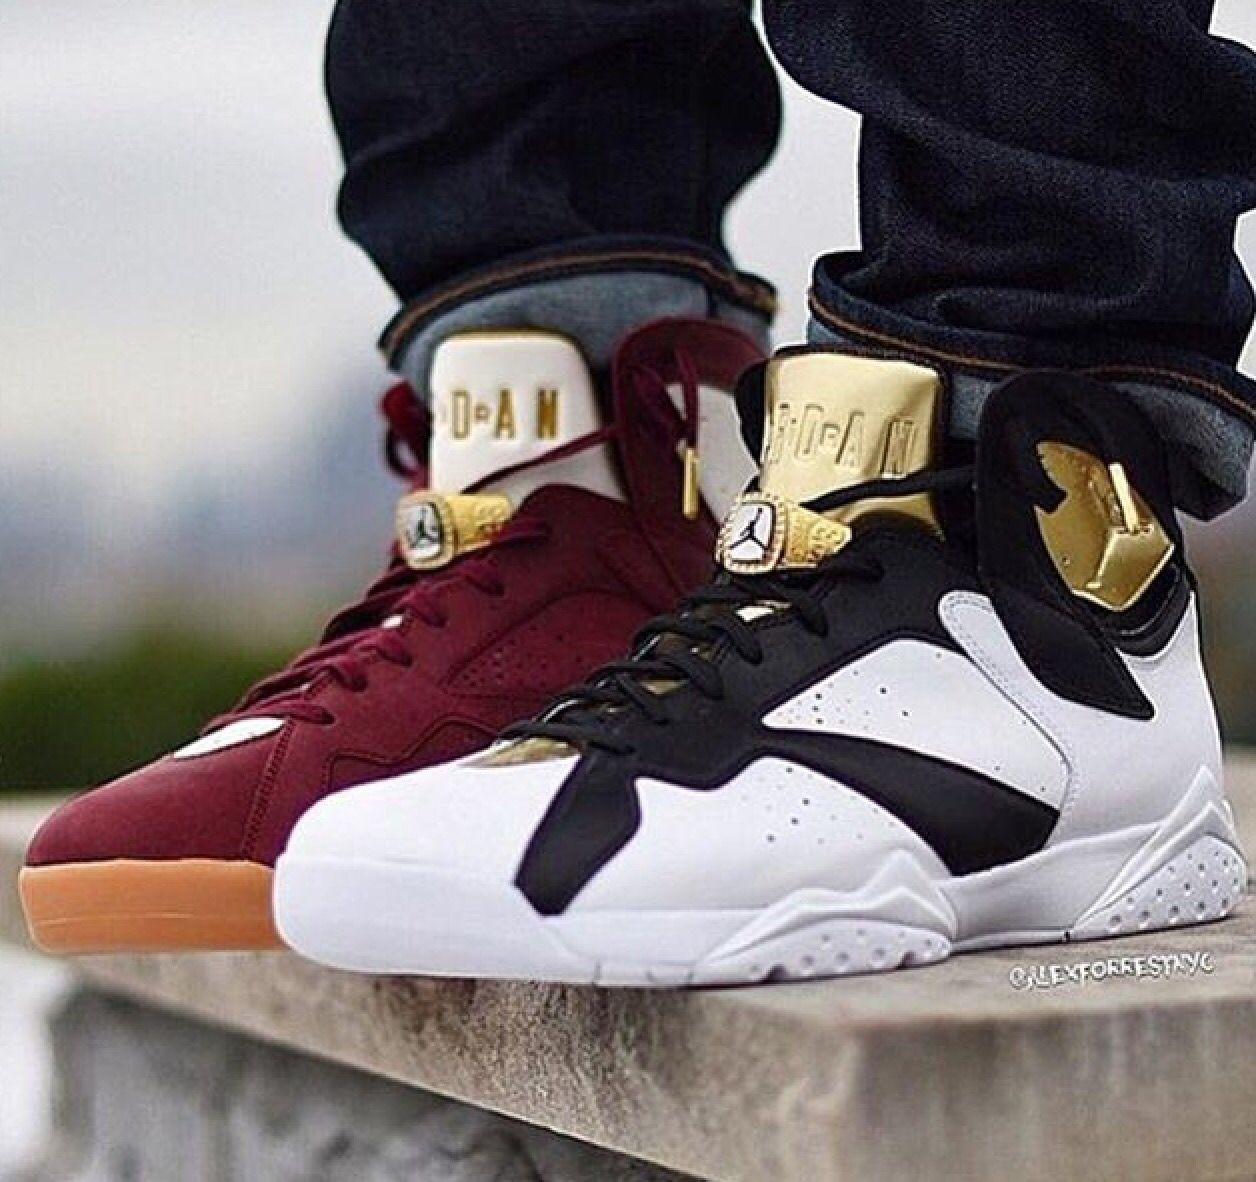 JORDANS Nike shoes for sale, Cheap womens nike shoes